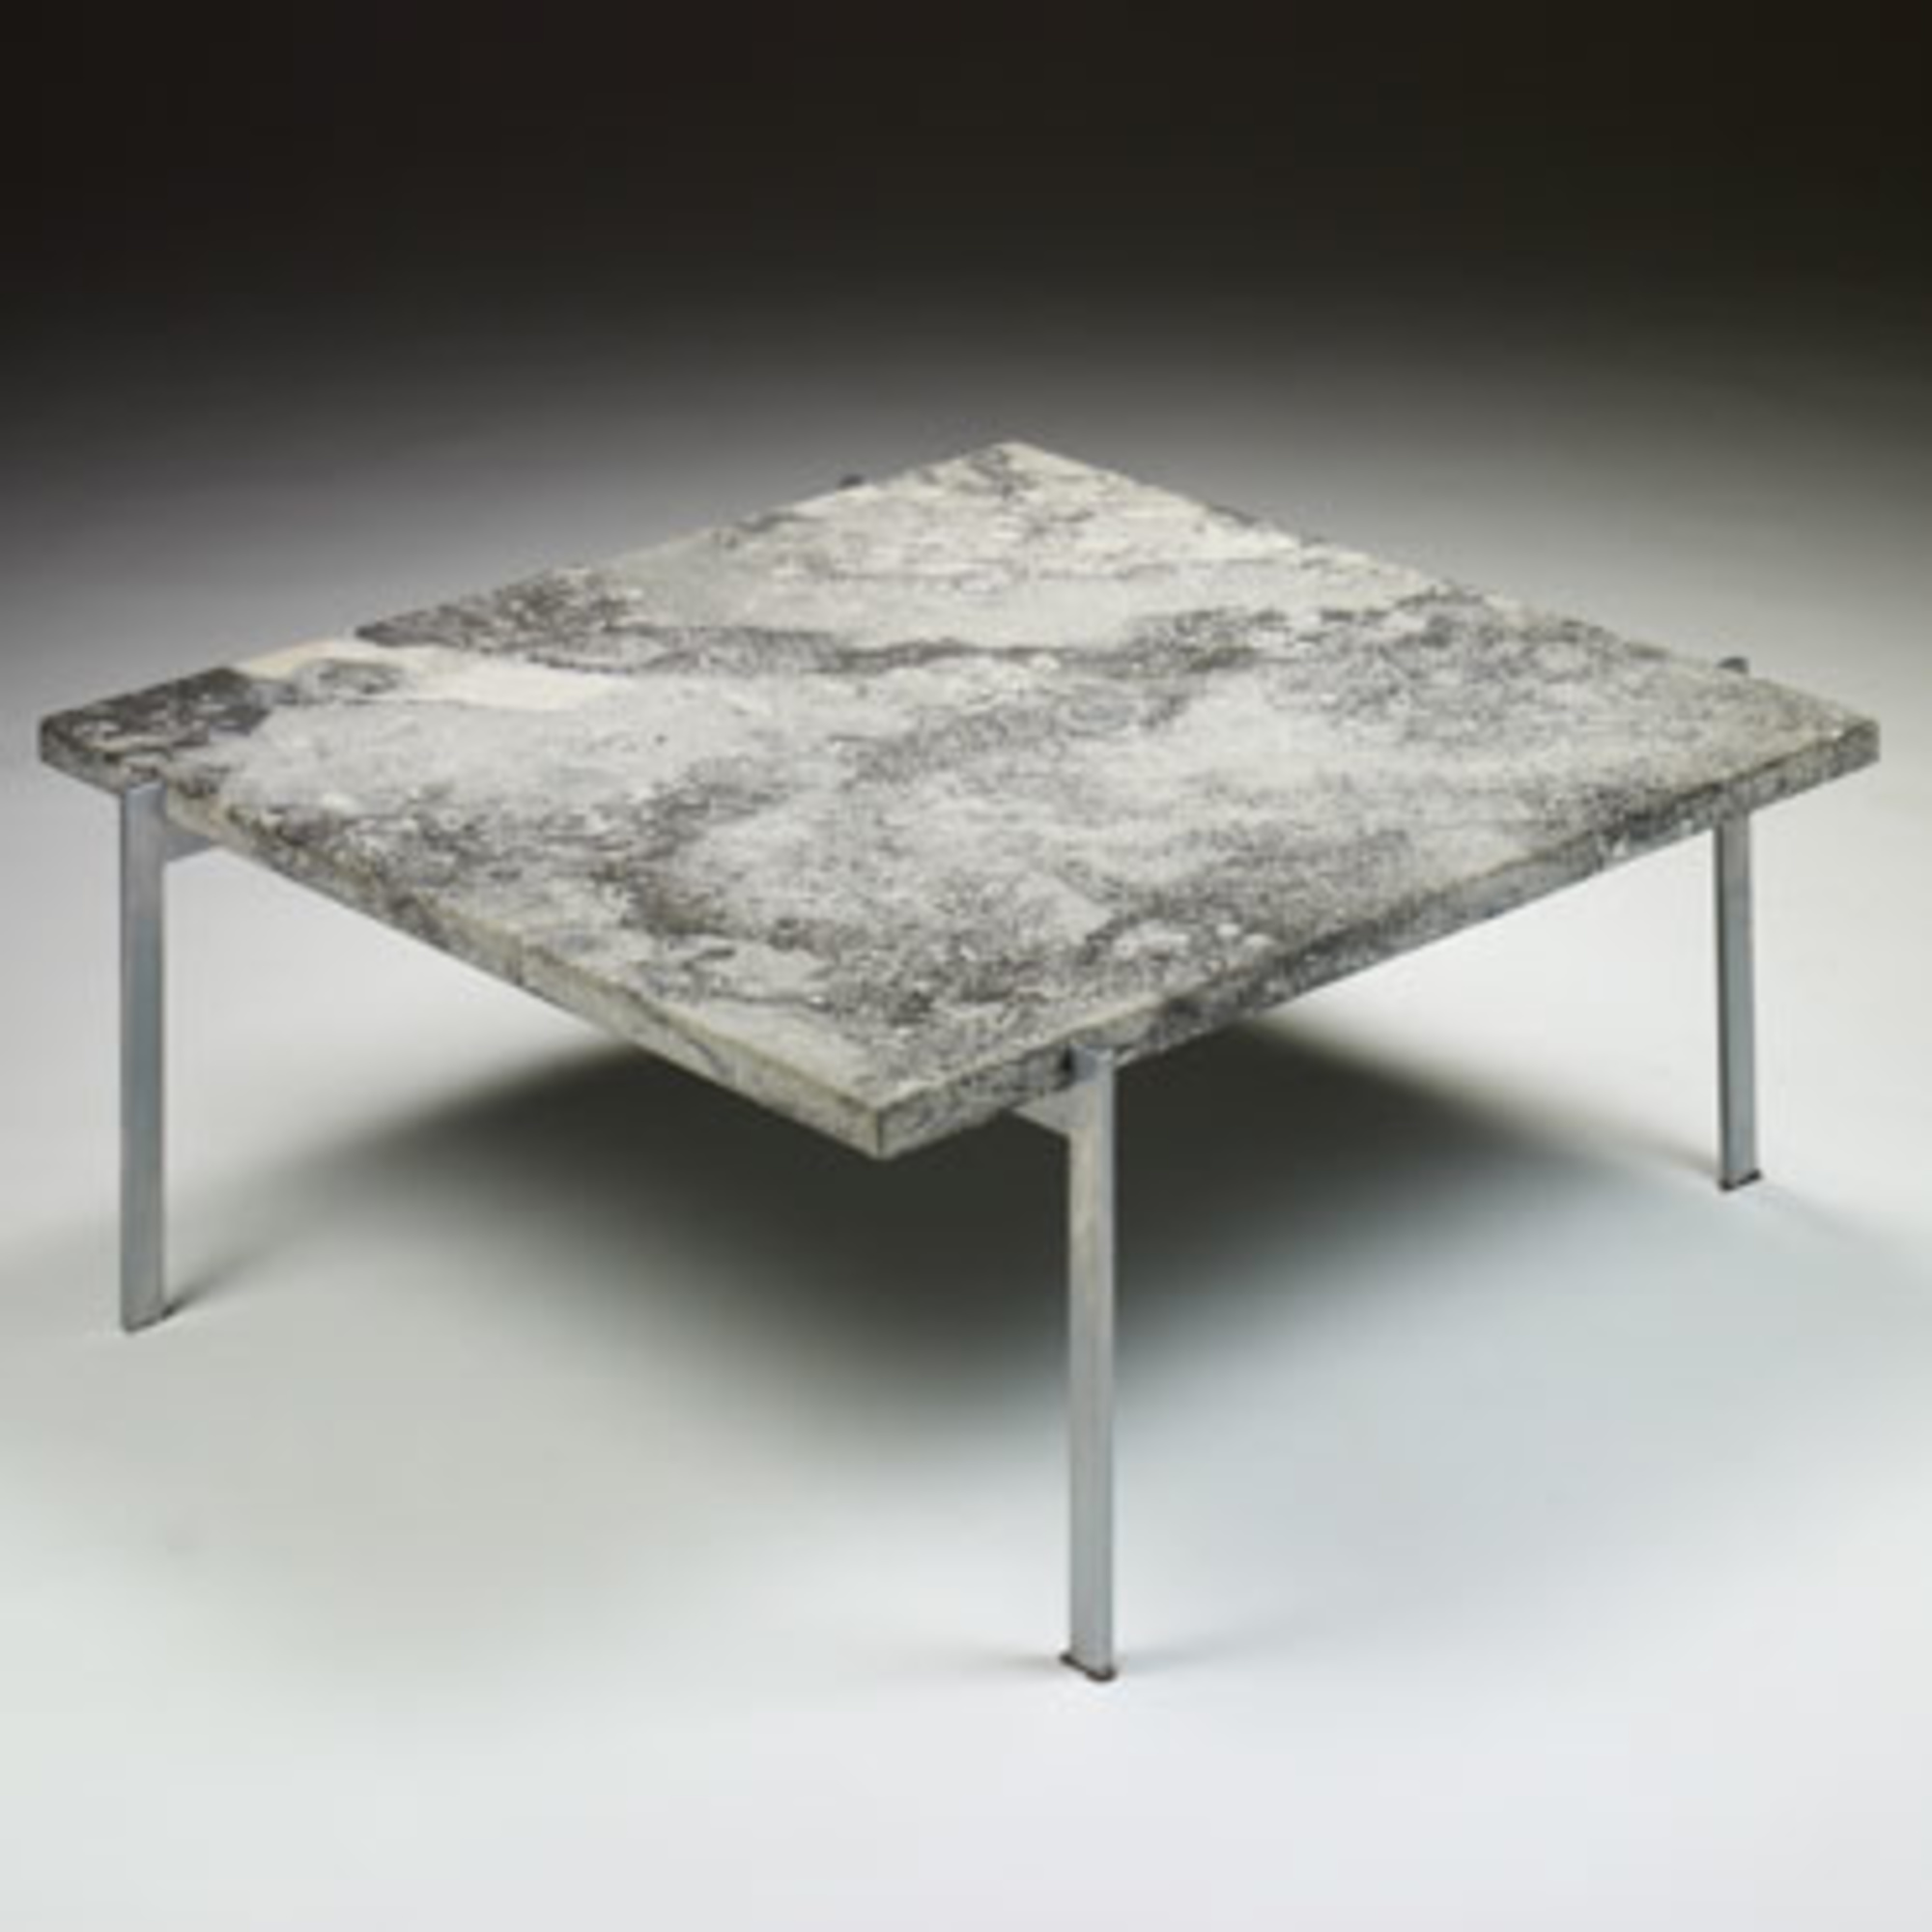 143 Poul Kjaerholm Pk 61 Coffee Table 1 Of